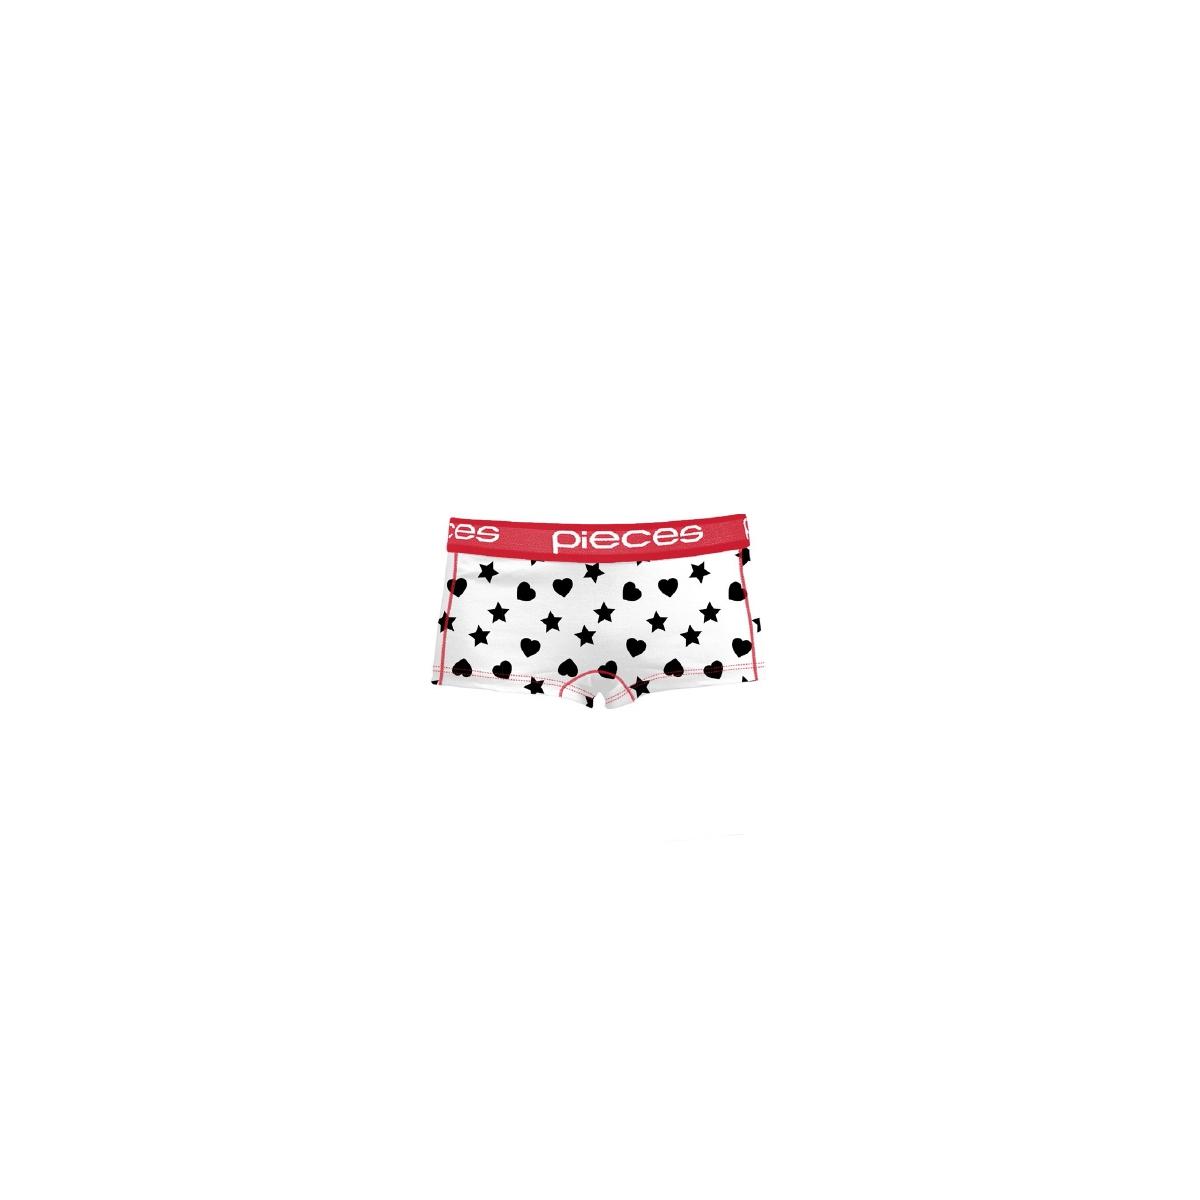 pclogo lady boxers 14-191 stripe 17080023 pieces ondergoed bright white